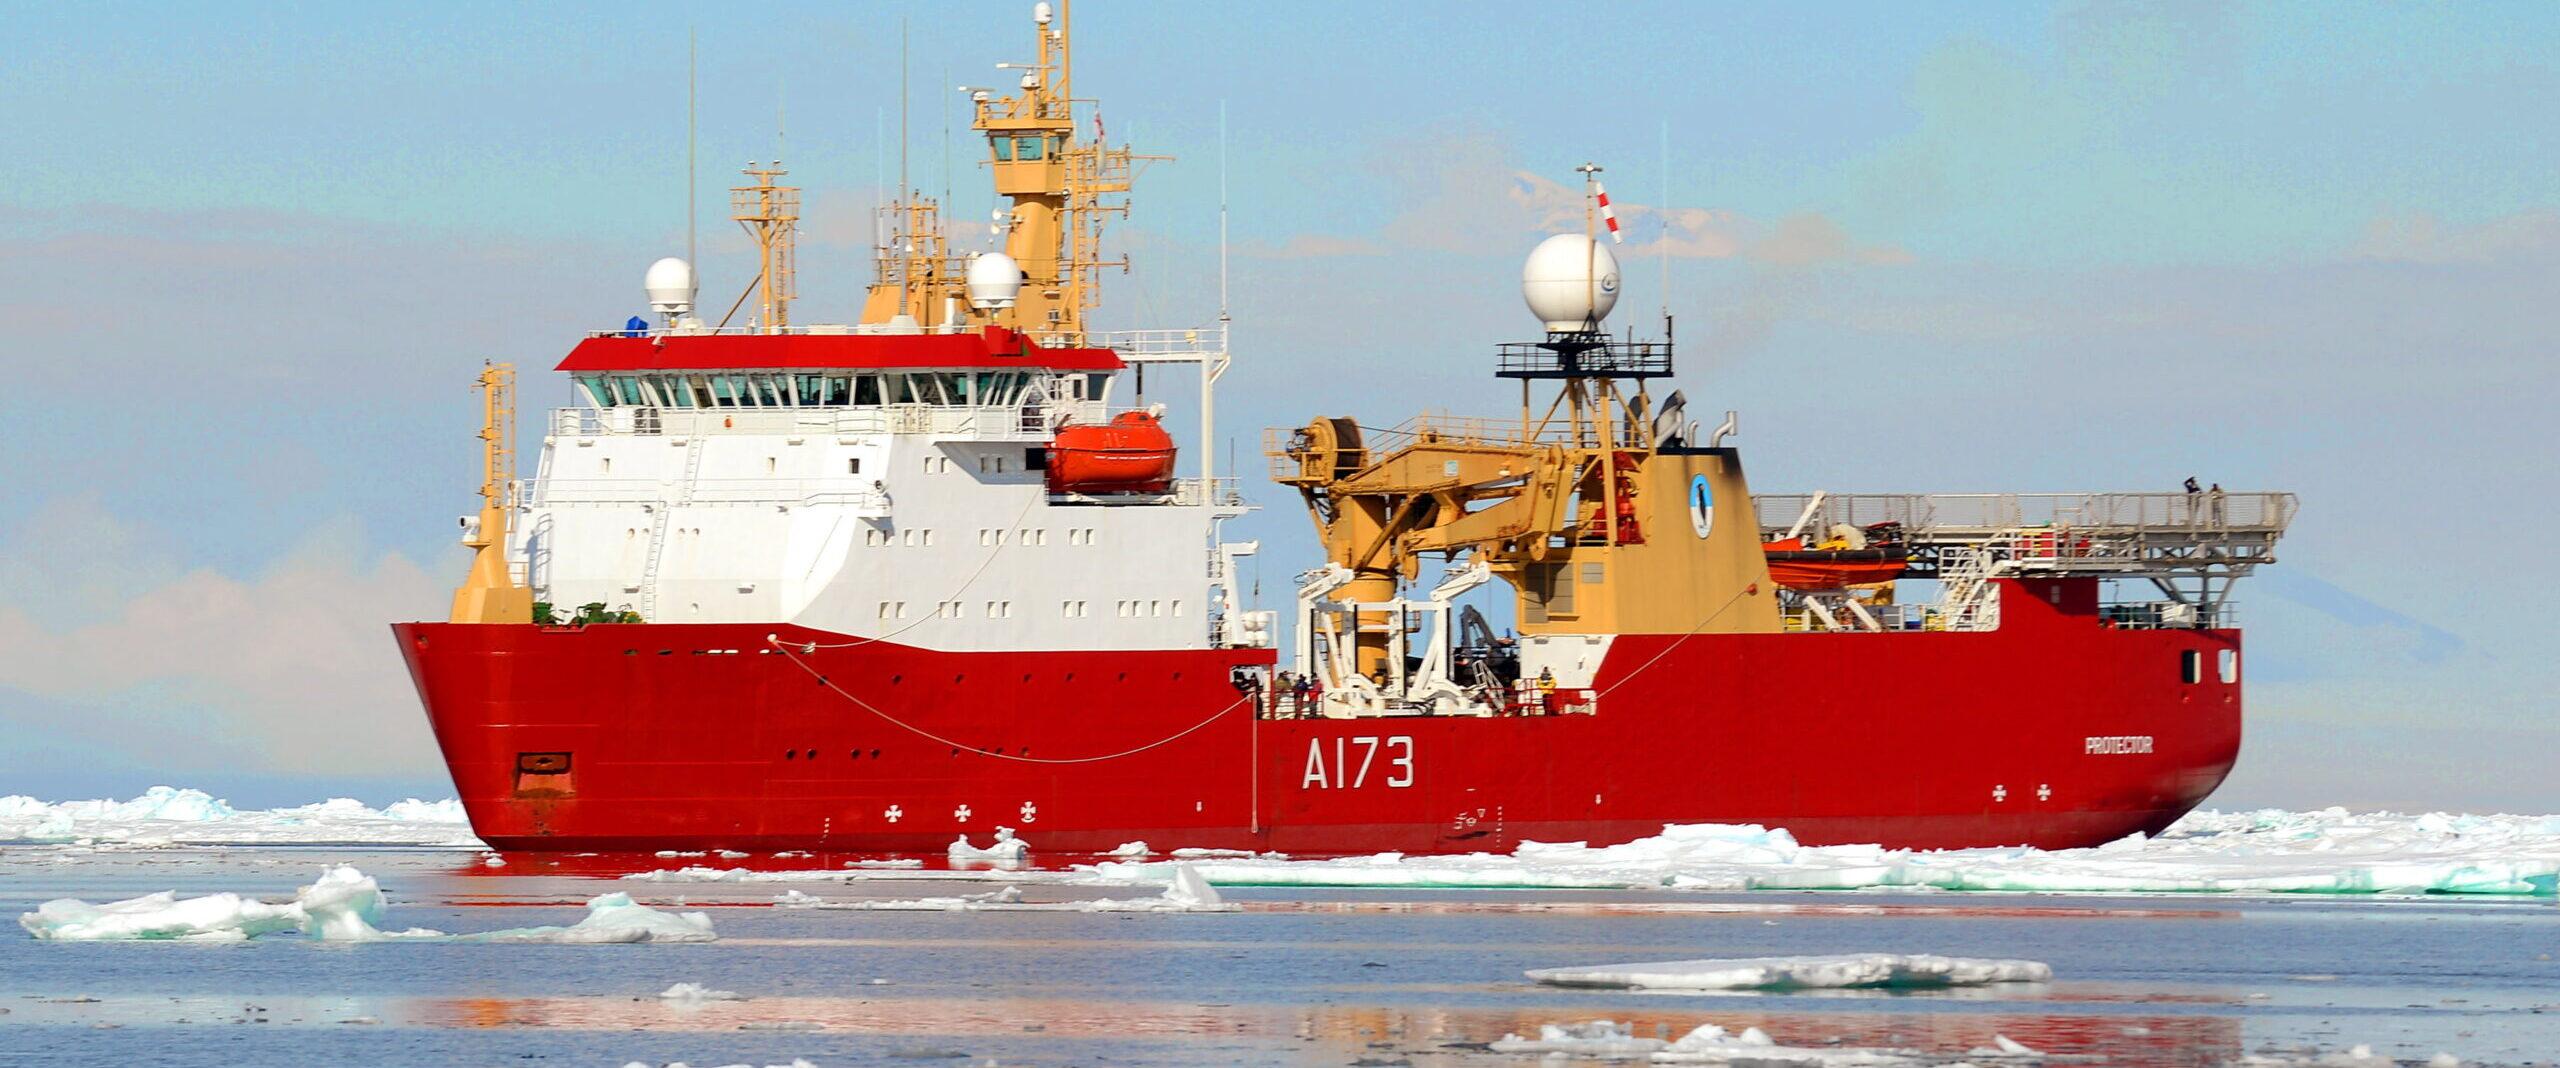 HMS Protector